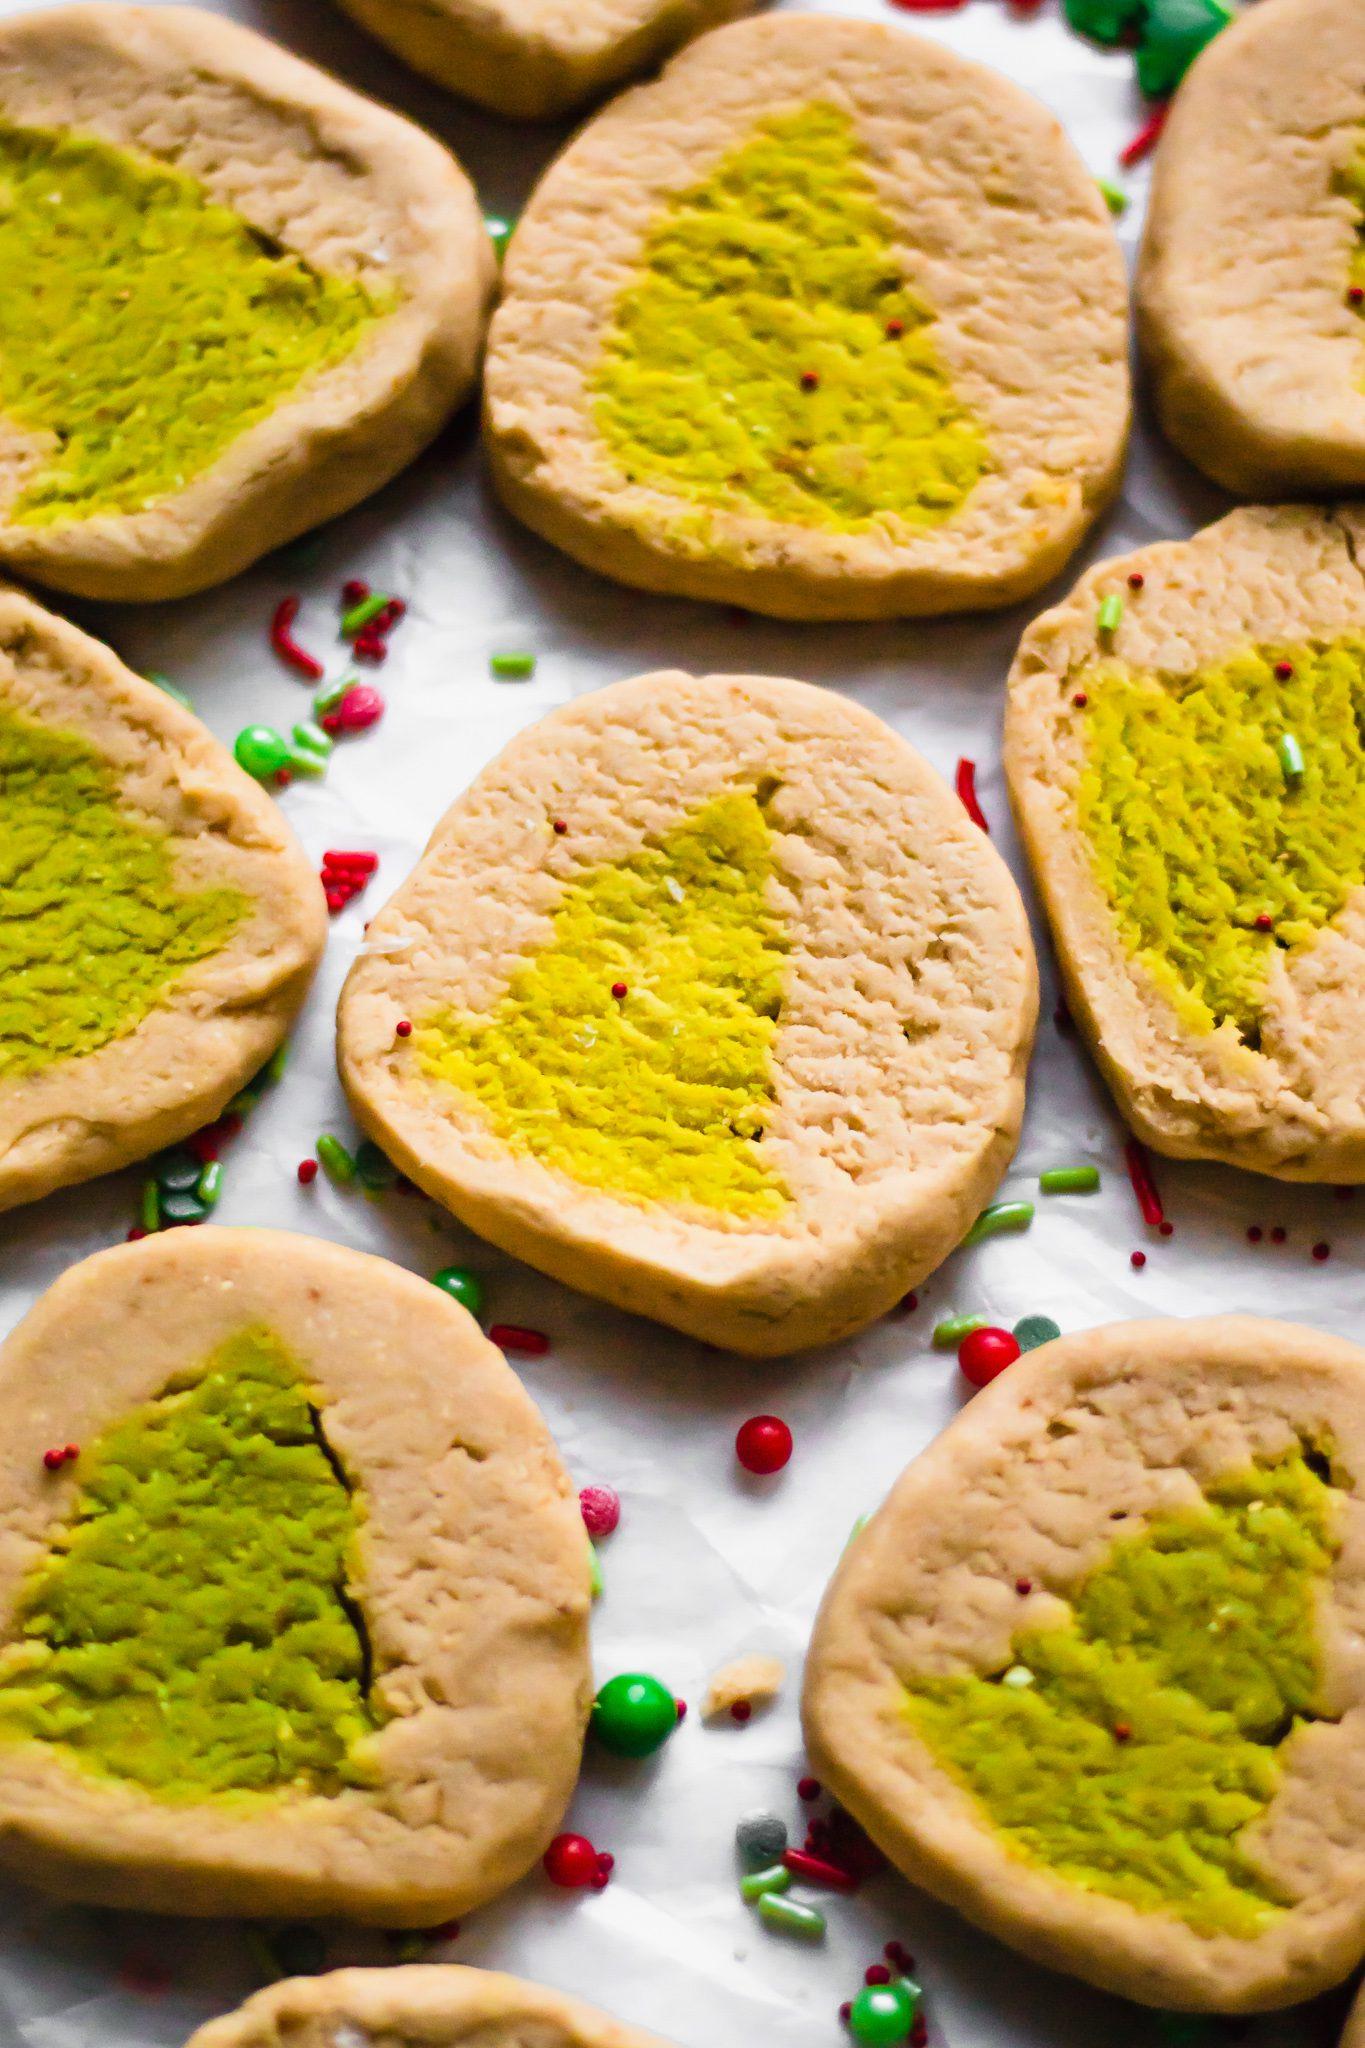 Vegan Christmas Tree Slice and Bake Cookies (Grain Free, Gluten Free!)